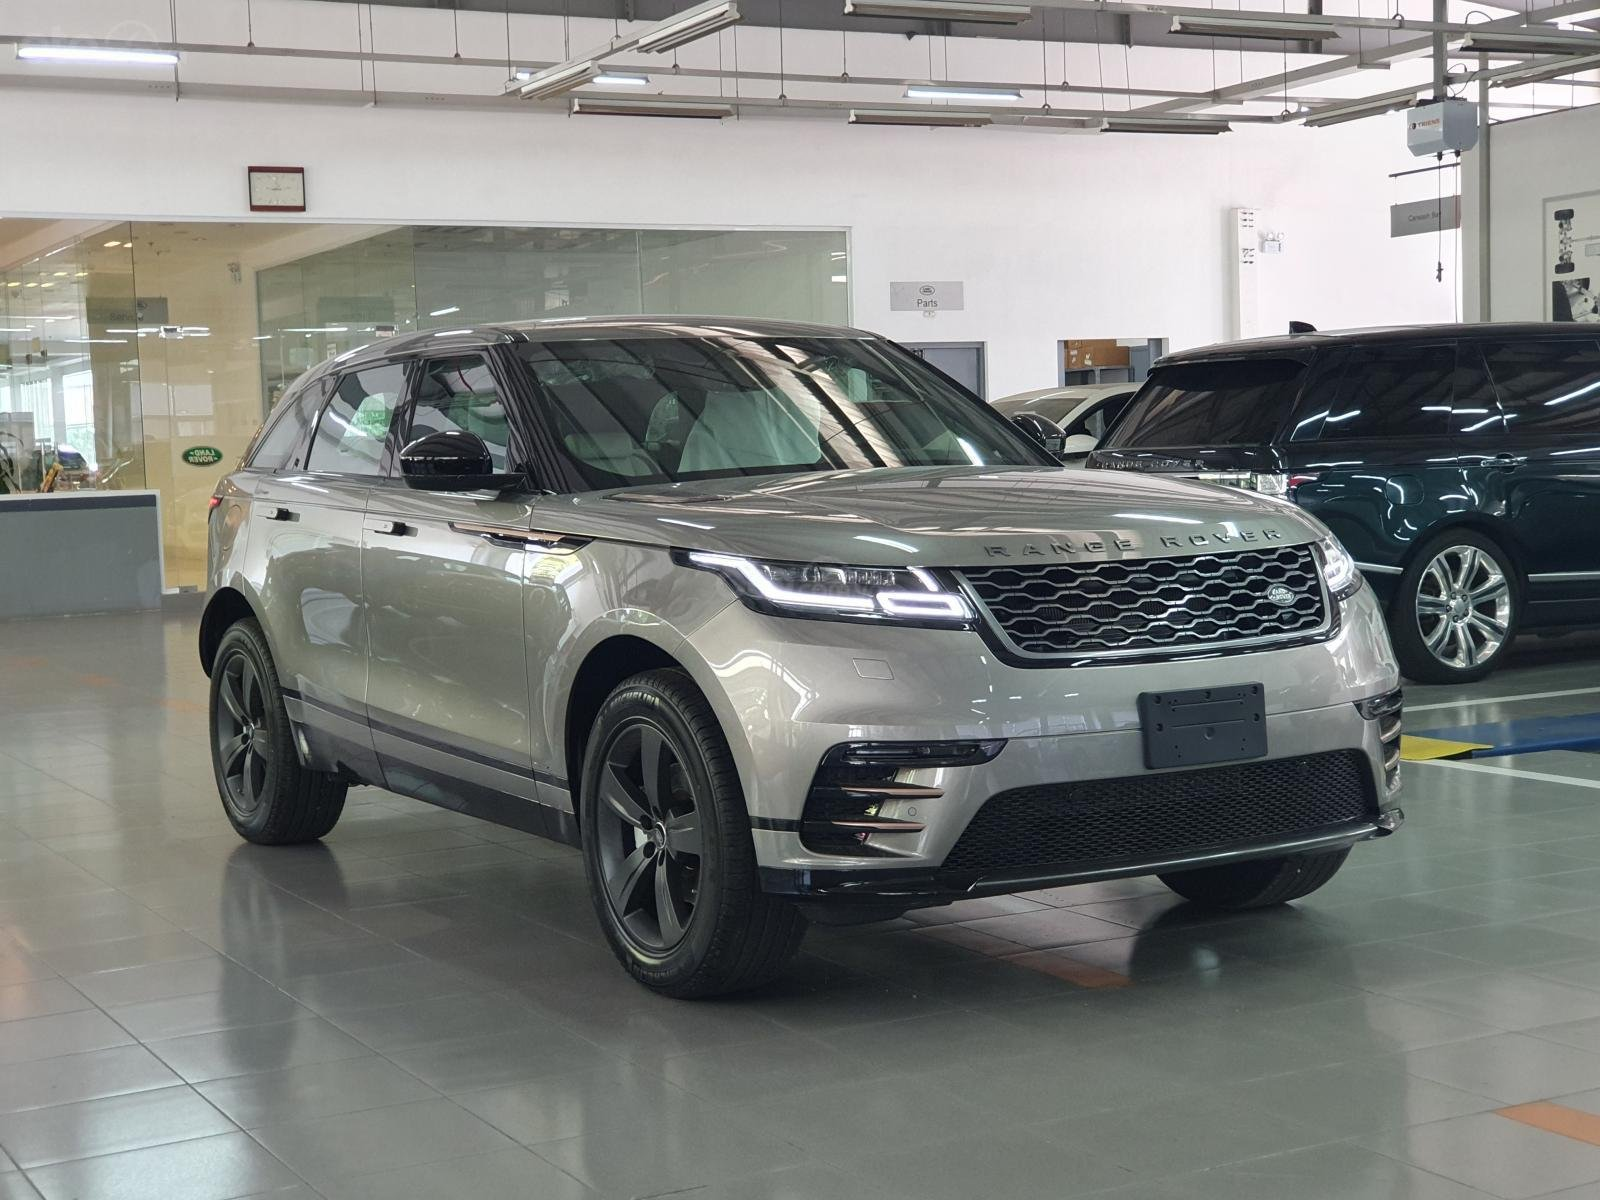 Sở hữu ngay Land Rover Range Rover Velar đời 2020 (3)